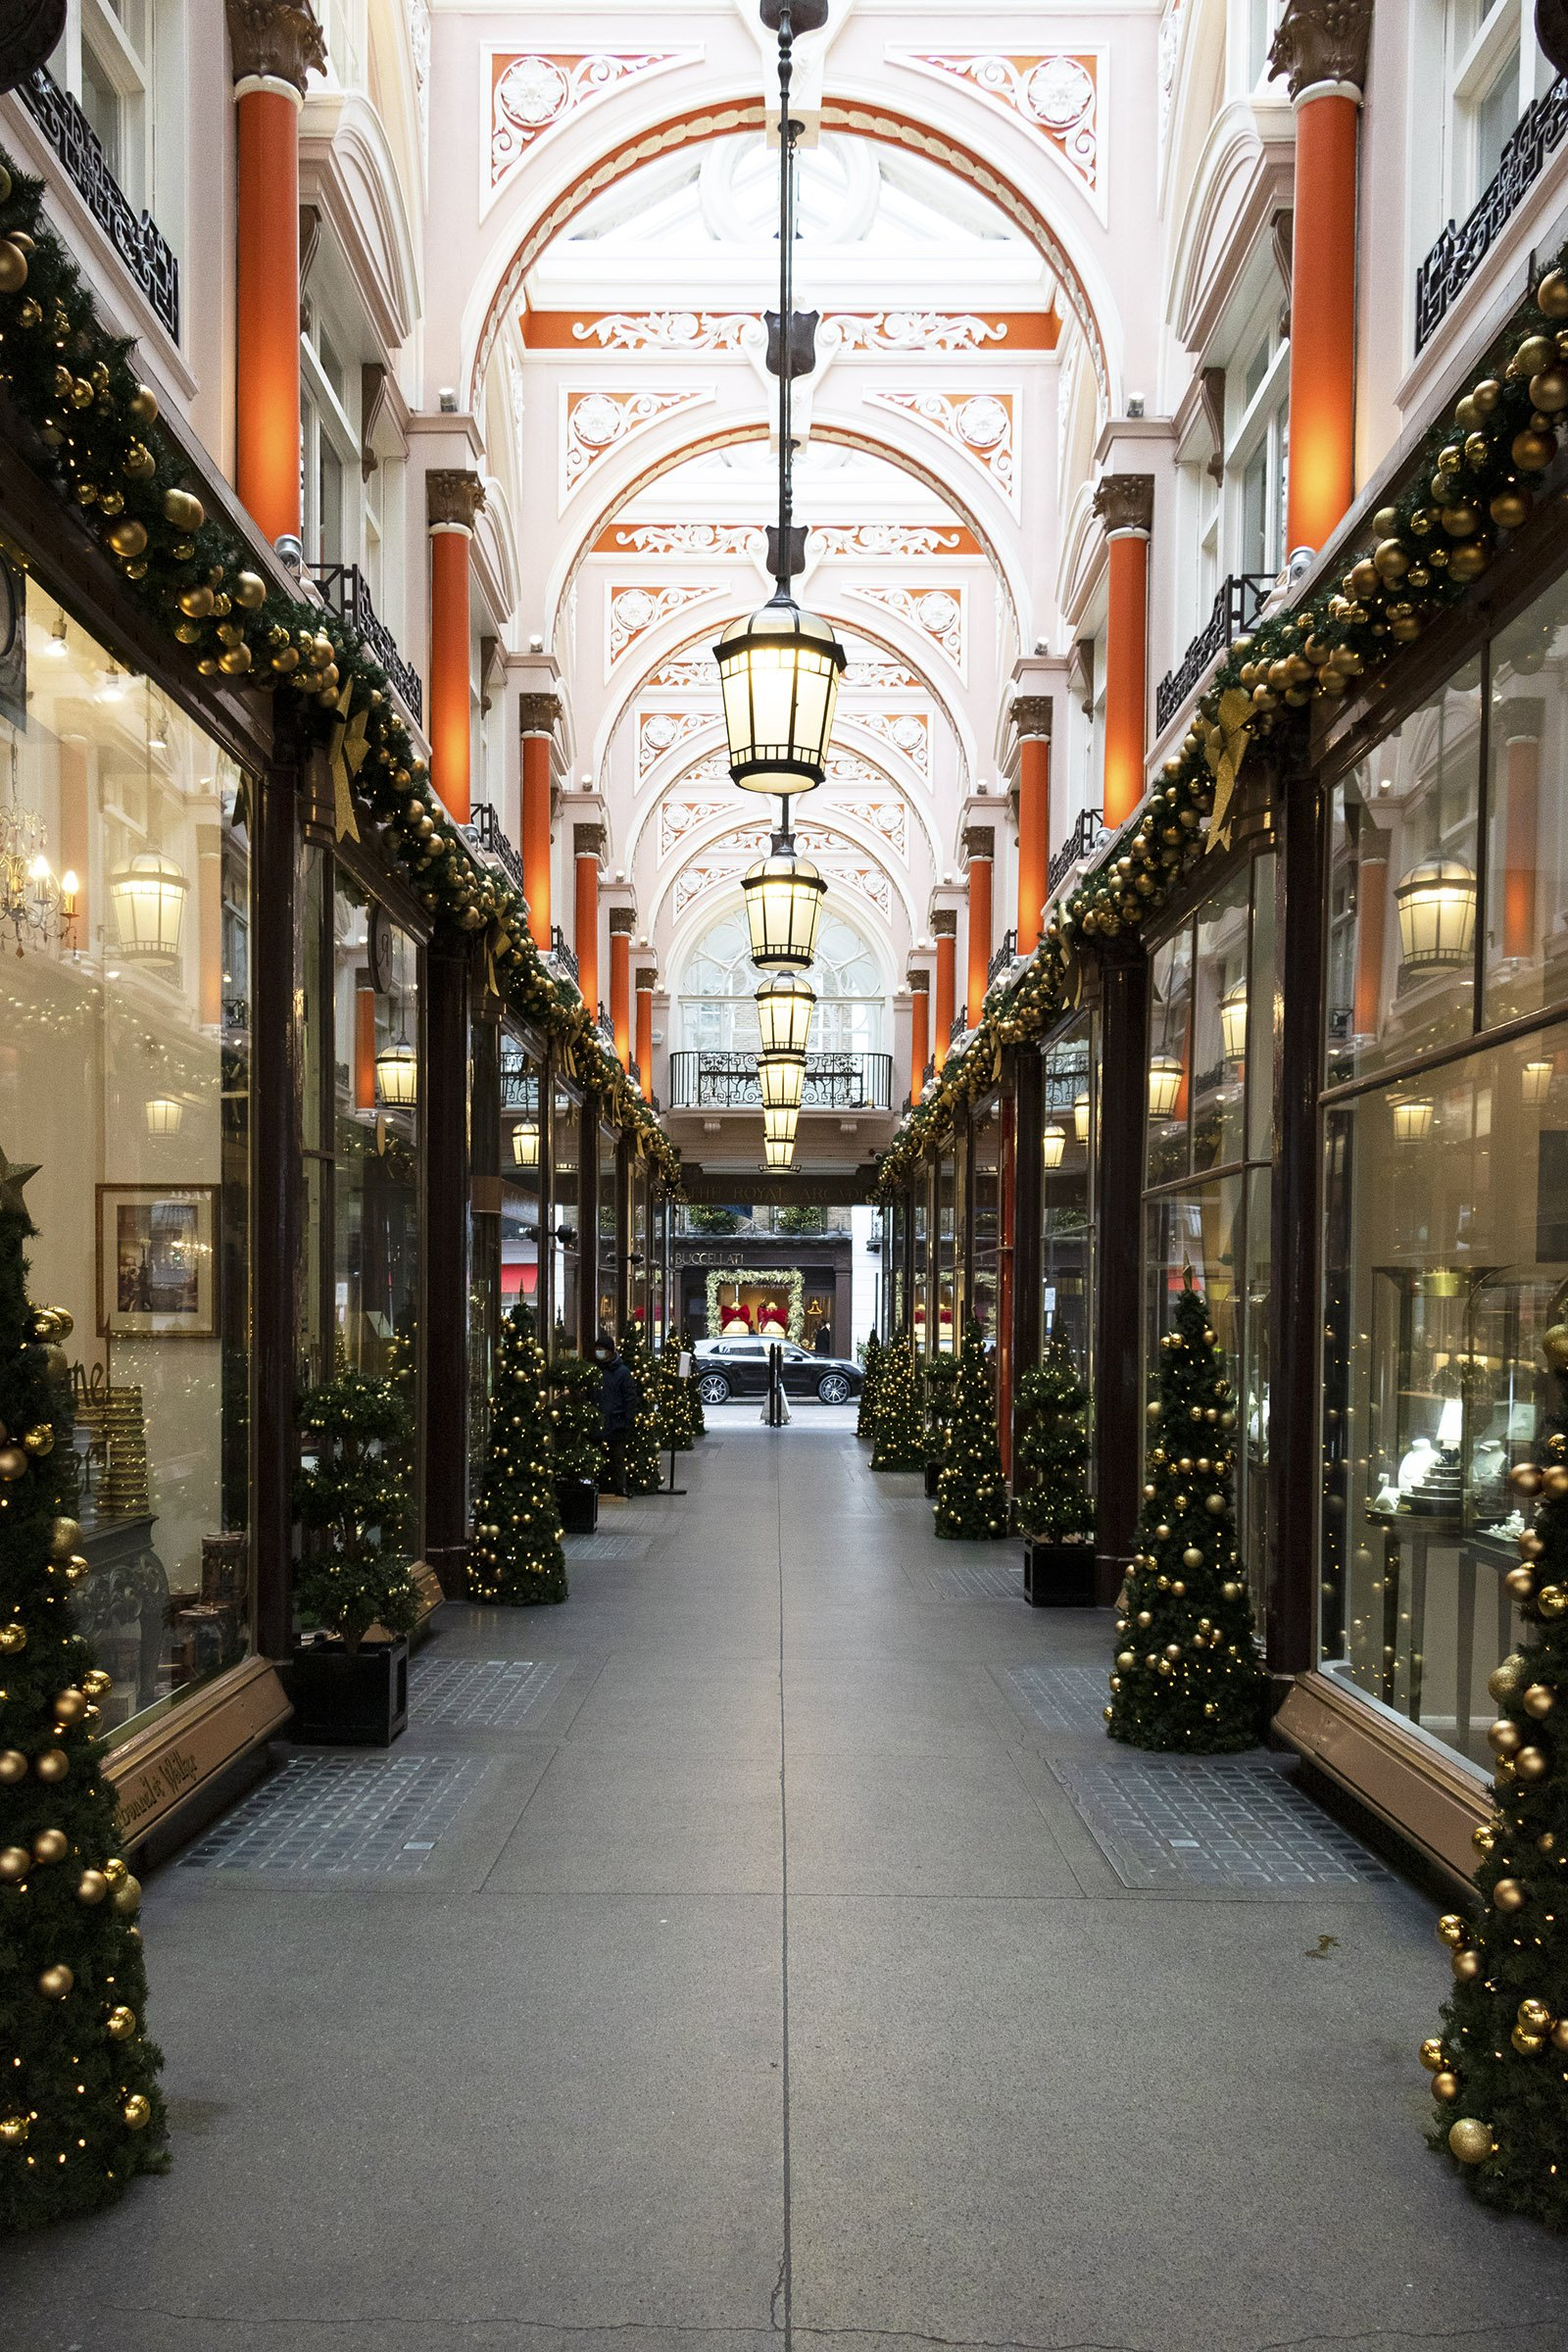 Royal Arcade Christmas decorations